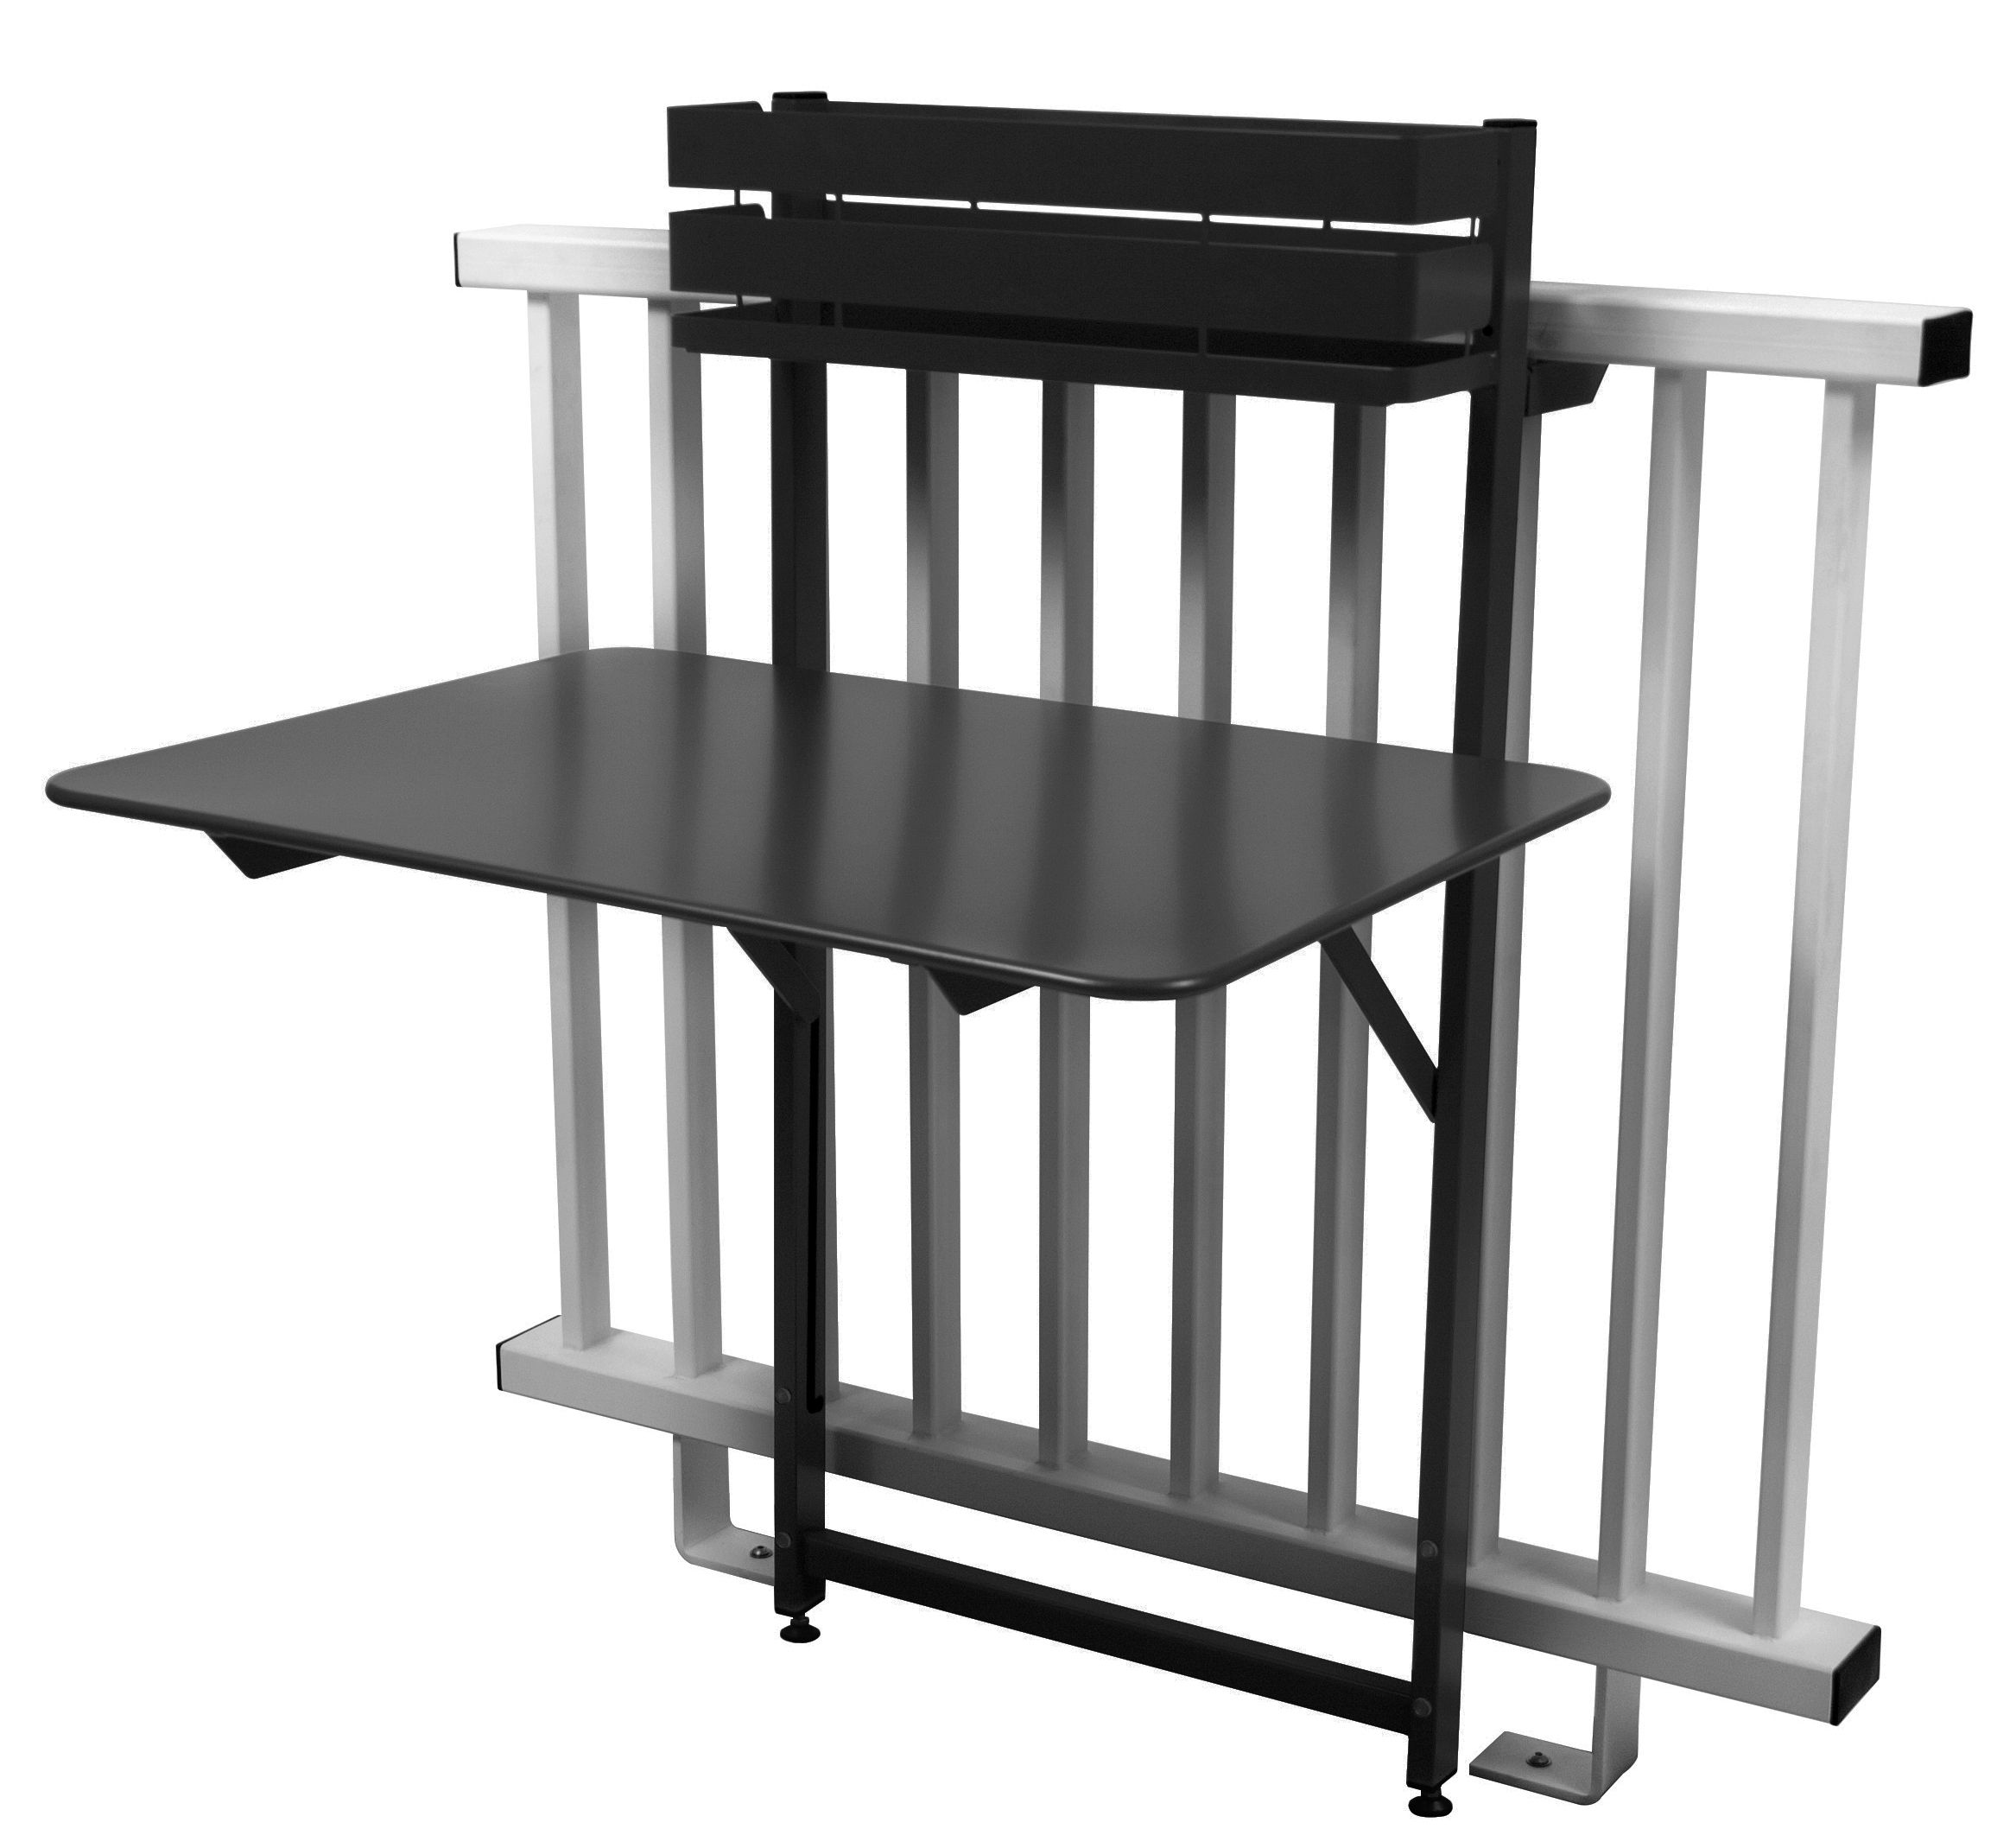 Table pliante balcon bistro rabattable 77 x 64 cm fermob - Table balcon pliante rabattable ...